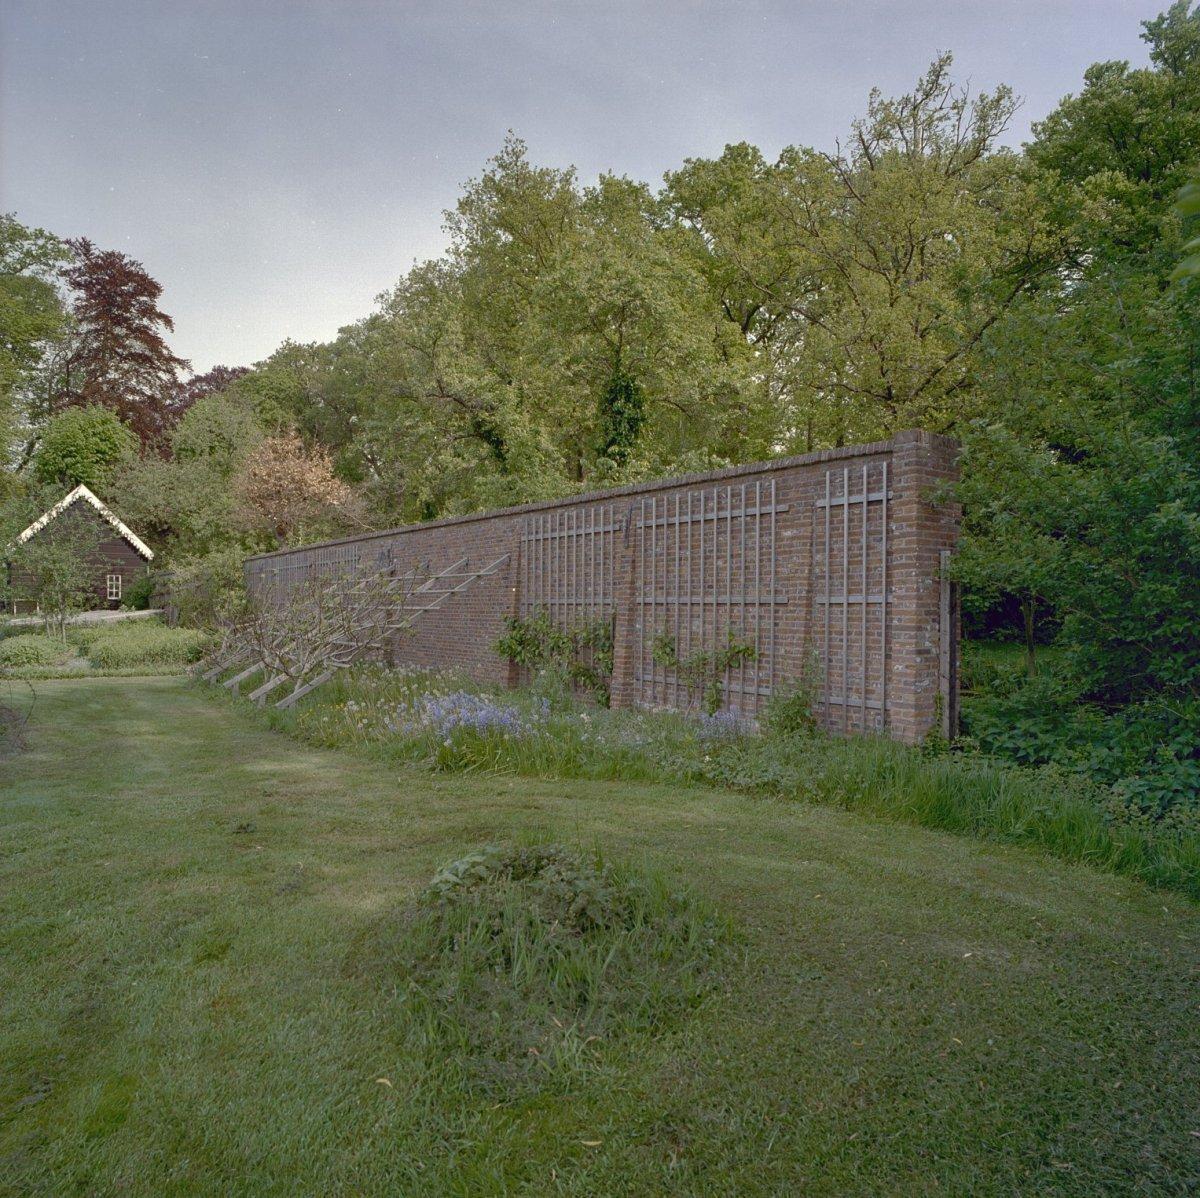 Oostergeest tuinkoepel in warmond monument - Latwerk houten ...